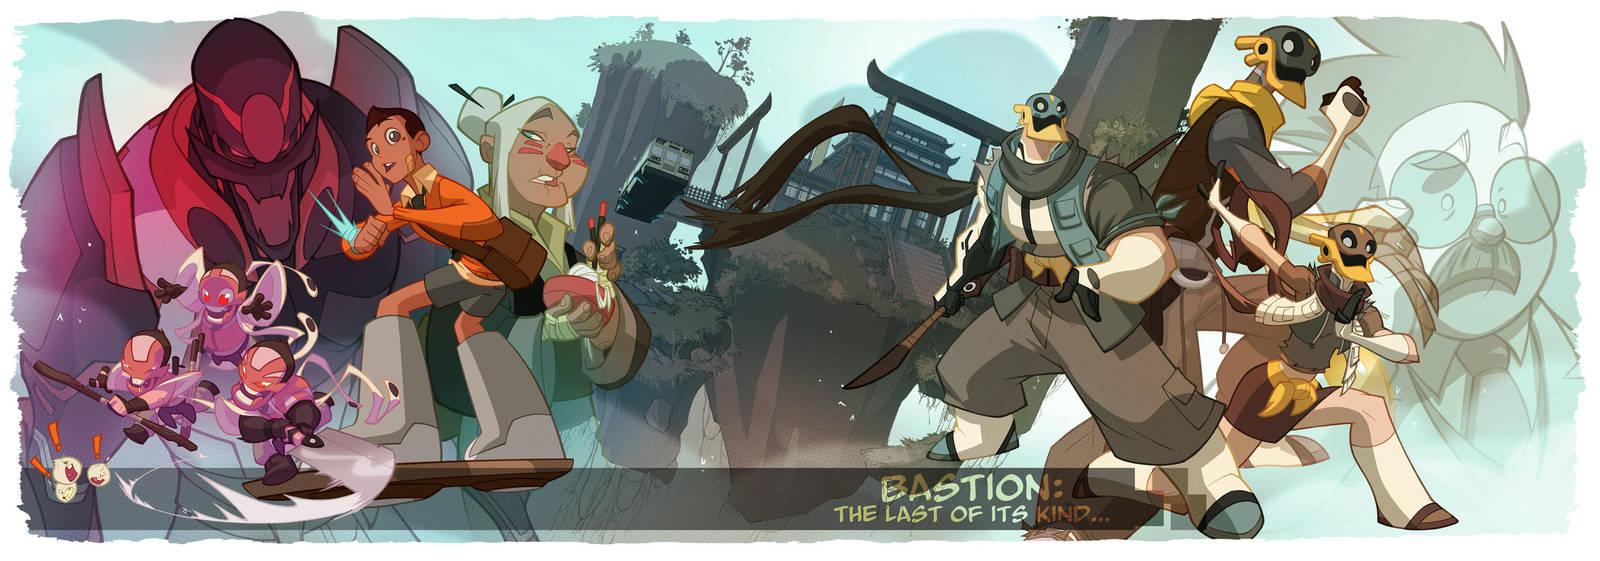 Bastion's 7 Kickstarter launches tomorrow! by cheeks-74